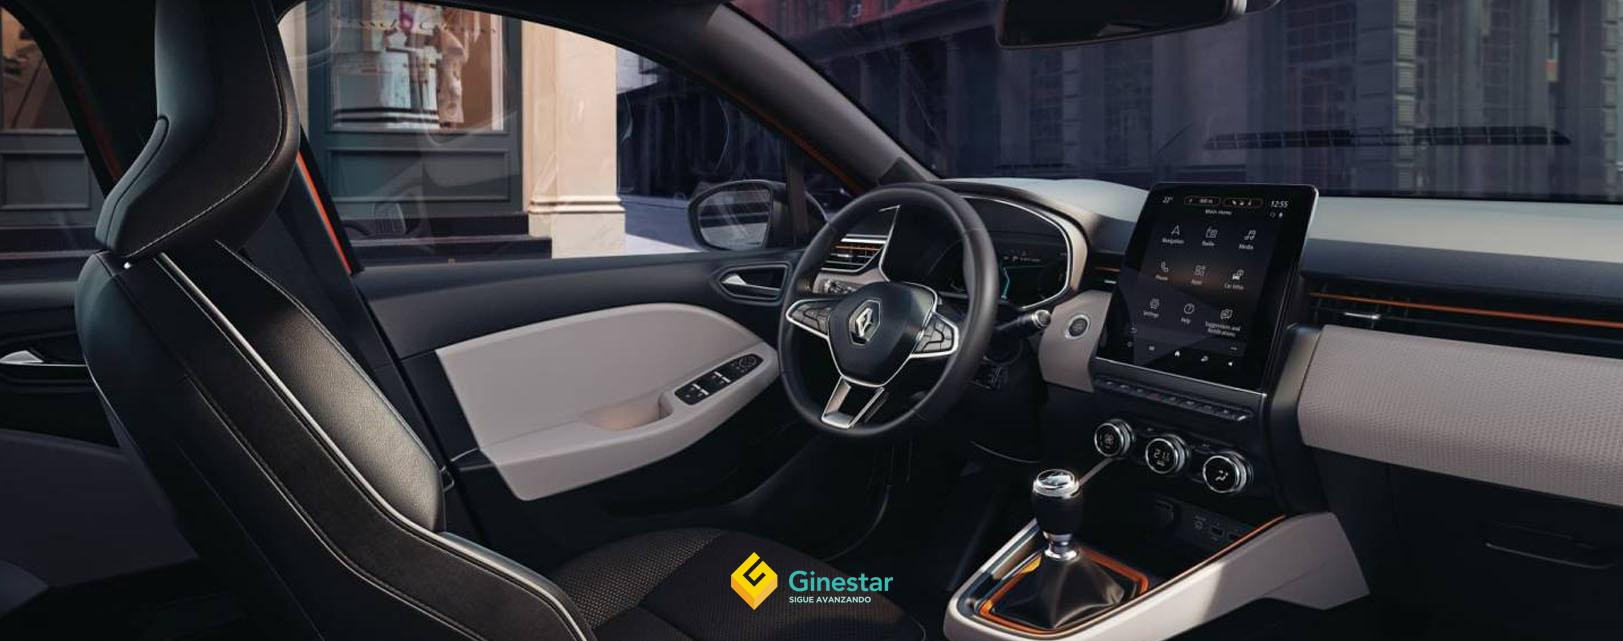 NUEVO RENAULT CLIO GINESTAR